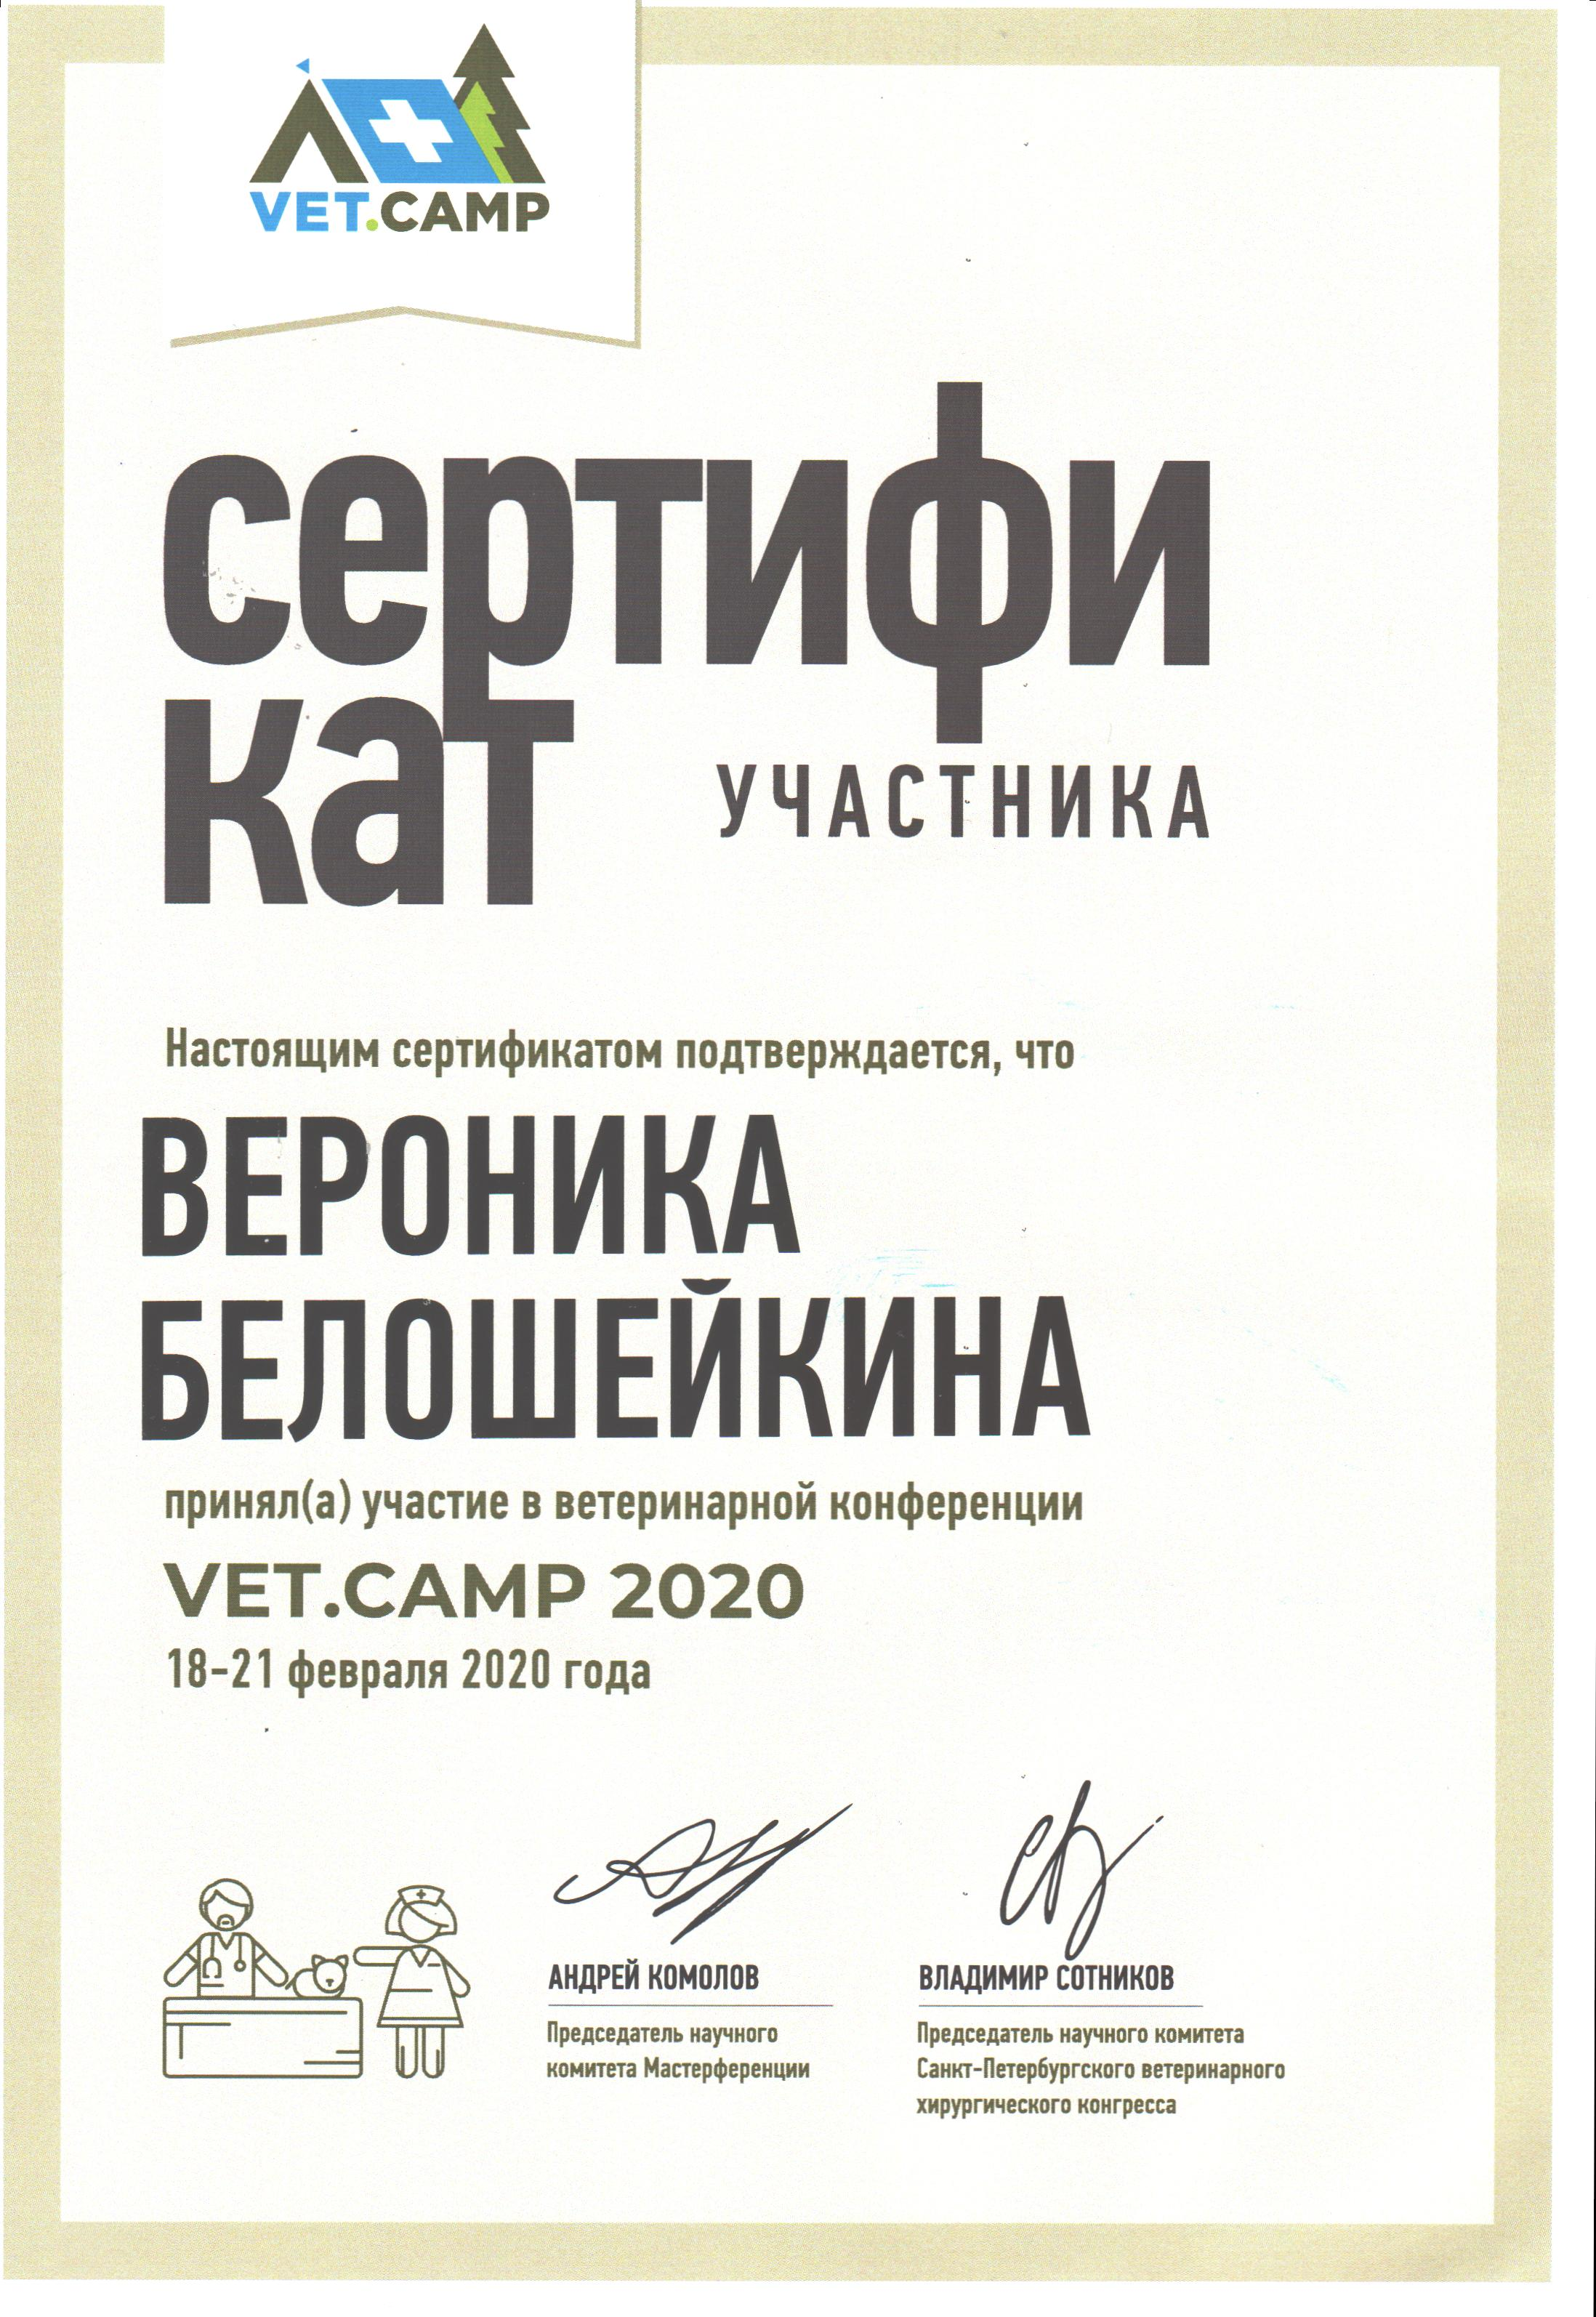 Vetcamp 2020 Сертификат. Вероника Белошейкина